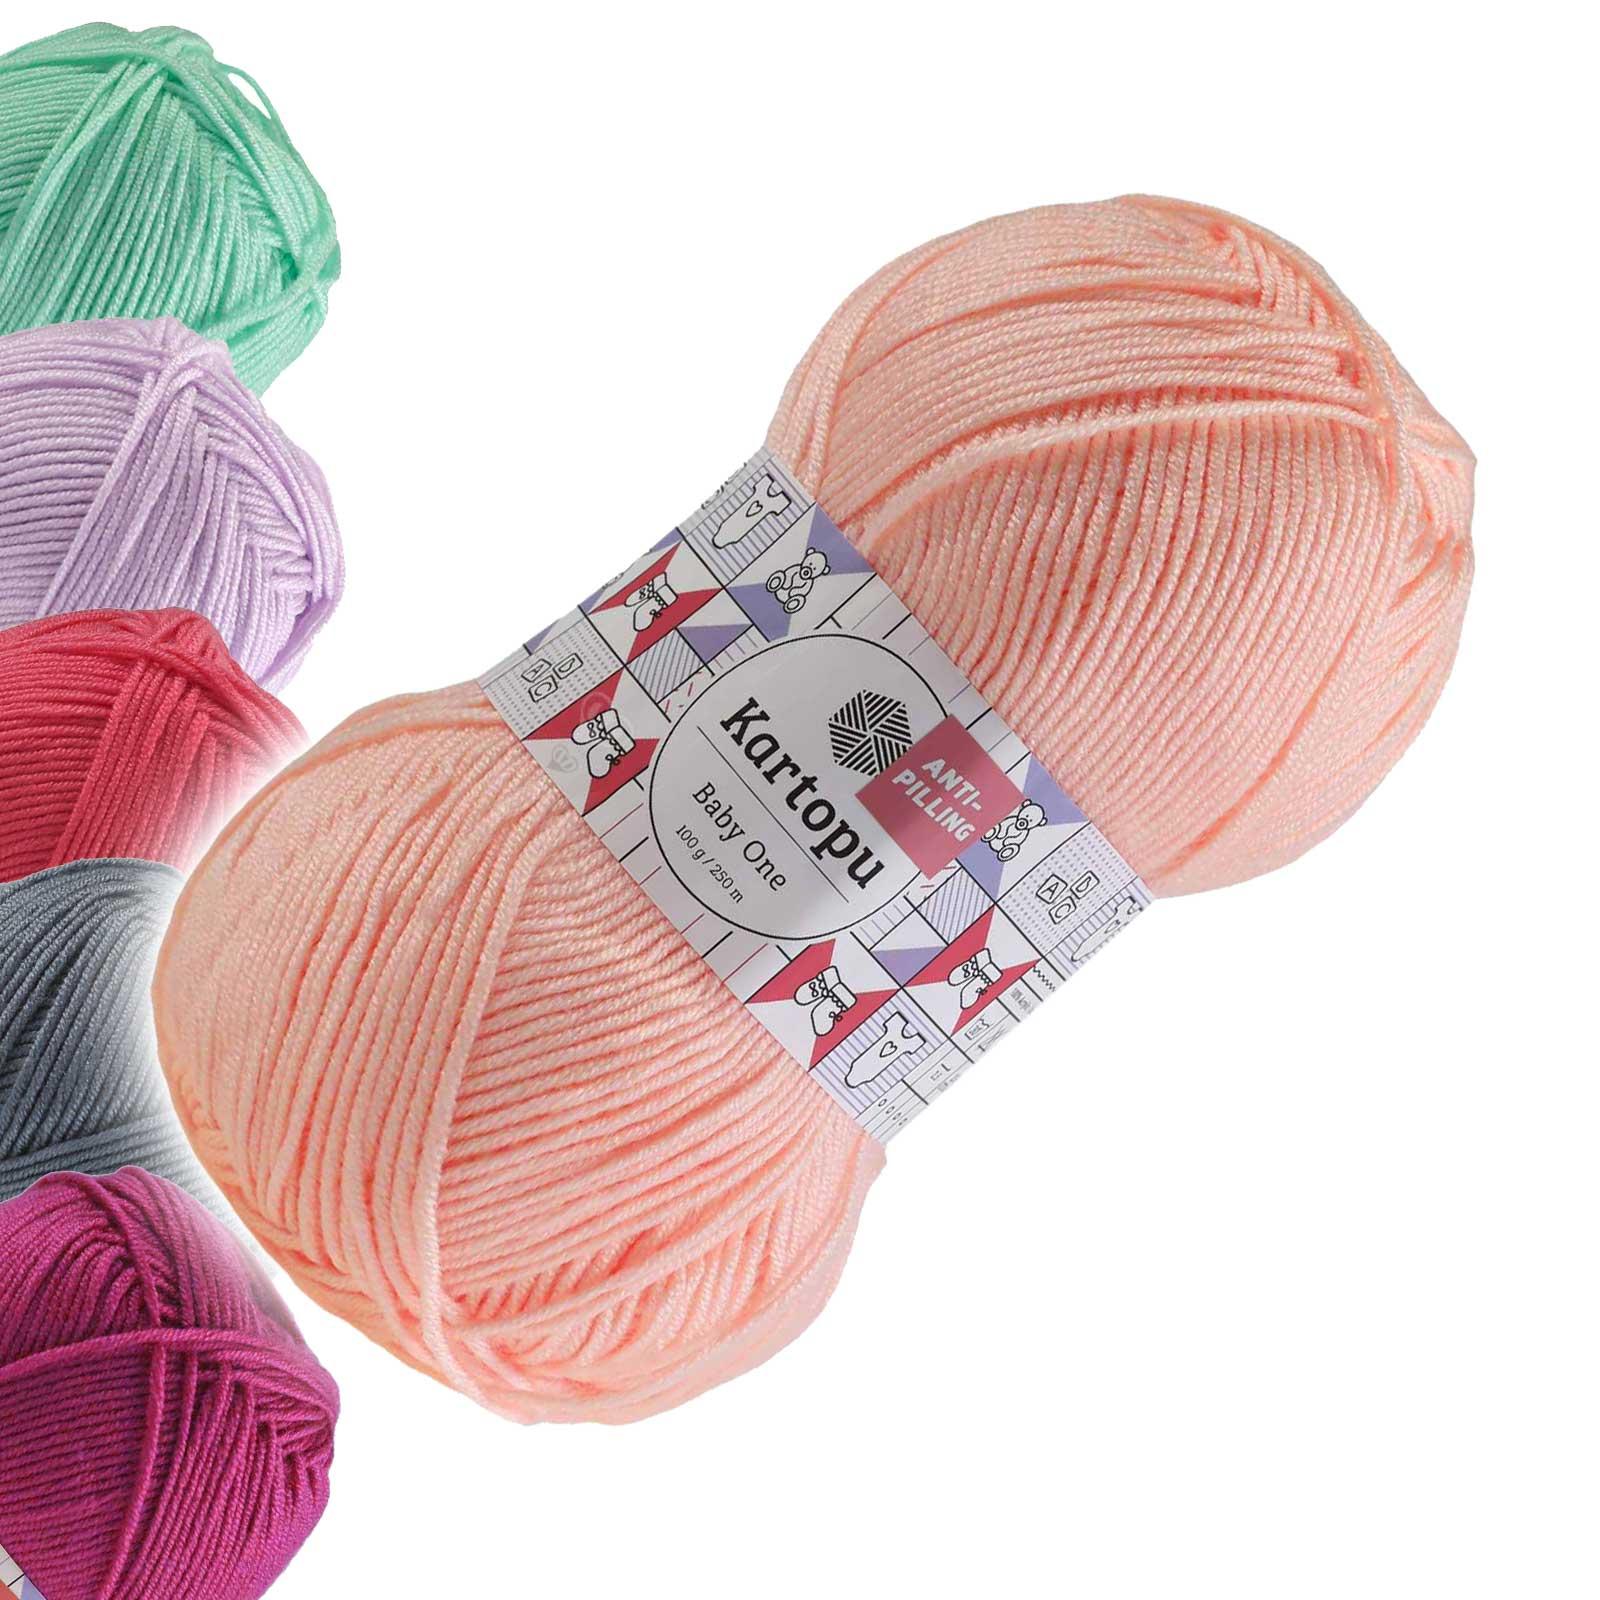 100g Strickgarn Kartopu BABY ONE Antipilling Babywolle Babystrickgarn, Farbwahl – Bild 25